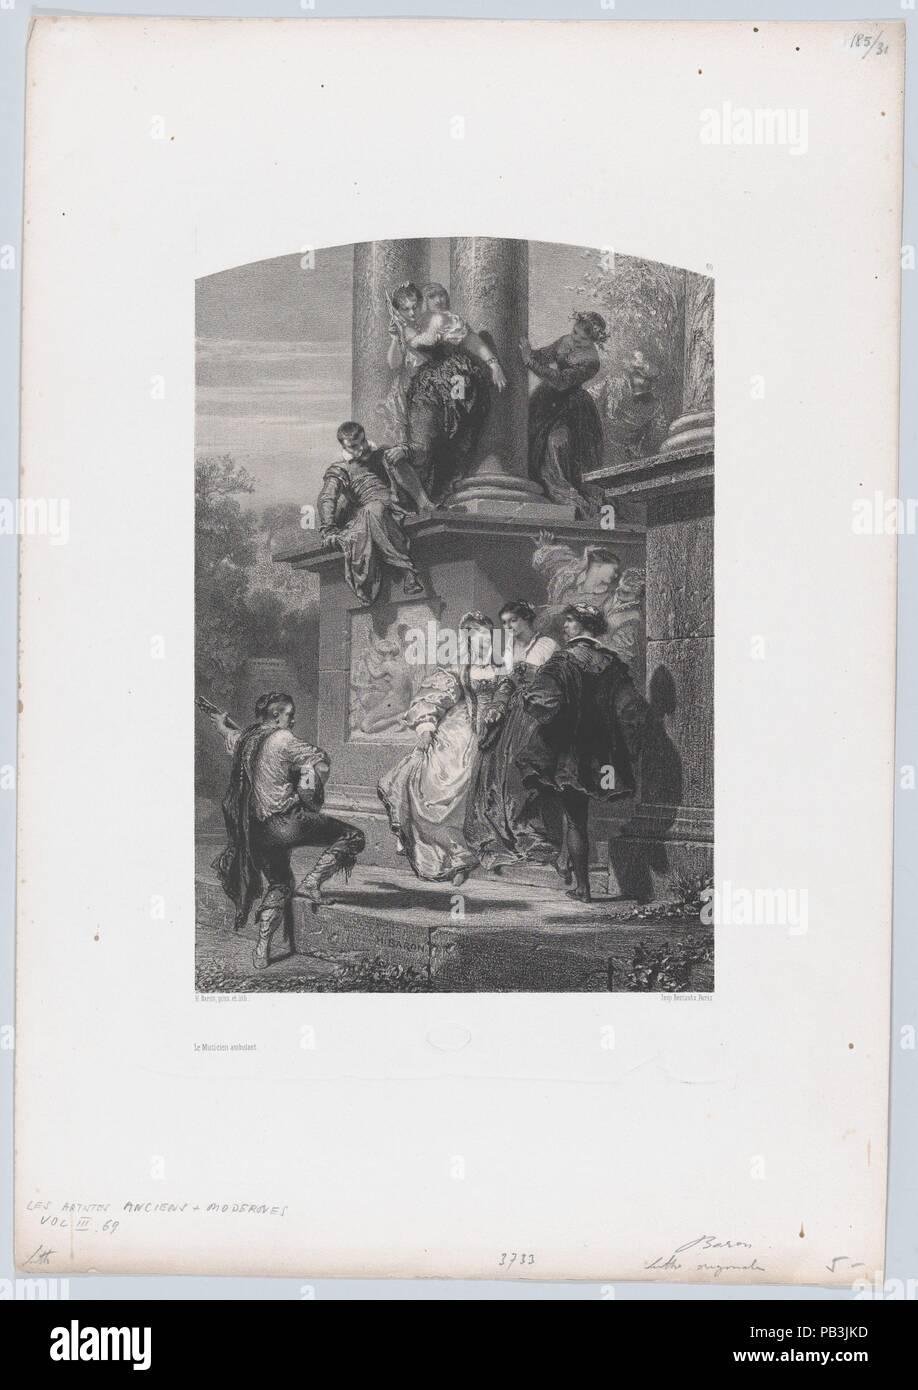 The Roaming Musician. Artist: Henri-Charles-Antoine Baron (French, Besançon 1816-1885 Geneva). Dimensions: Sheet: 17 9/16 × 12 3/8 in. (44.6 × 31.5 cm)  Image: 10 9/16 × 7 5/16 in. (26.8 × 18.5 cm). Printer: Bertauts. Series/Portfolio: Les Artistes Anciens et Modernes. Date: 1853. Museum: Metropolitan Museum of Art, New York, USA. - Stock Image